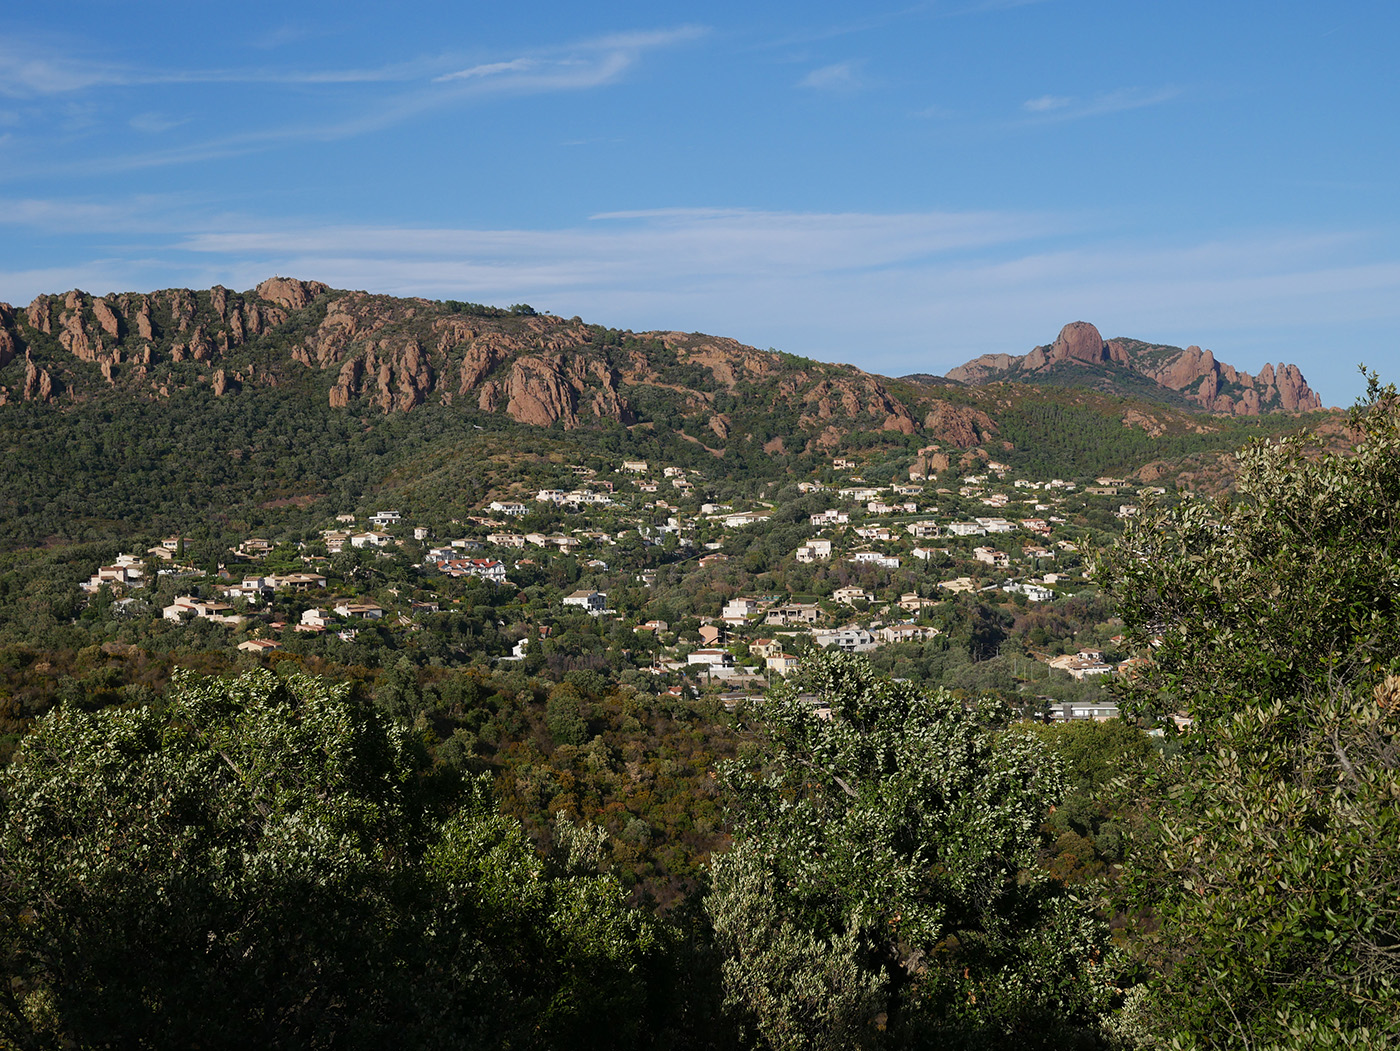 Visiter l'Esterel depuis Agay